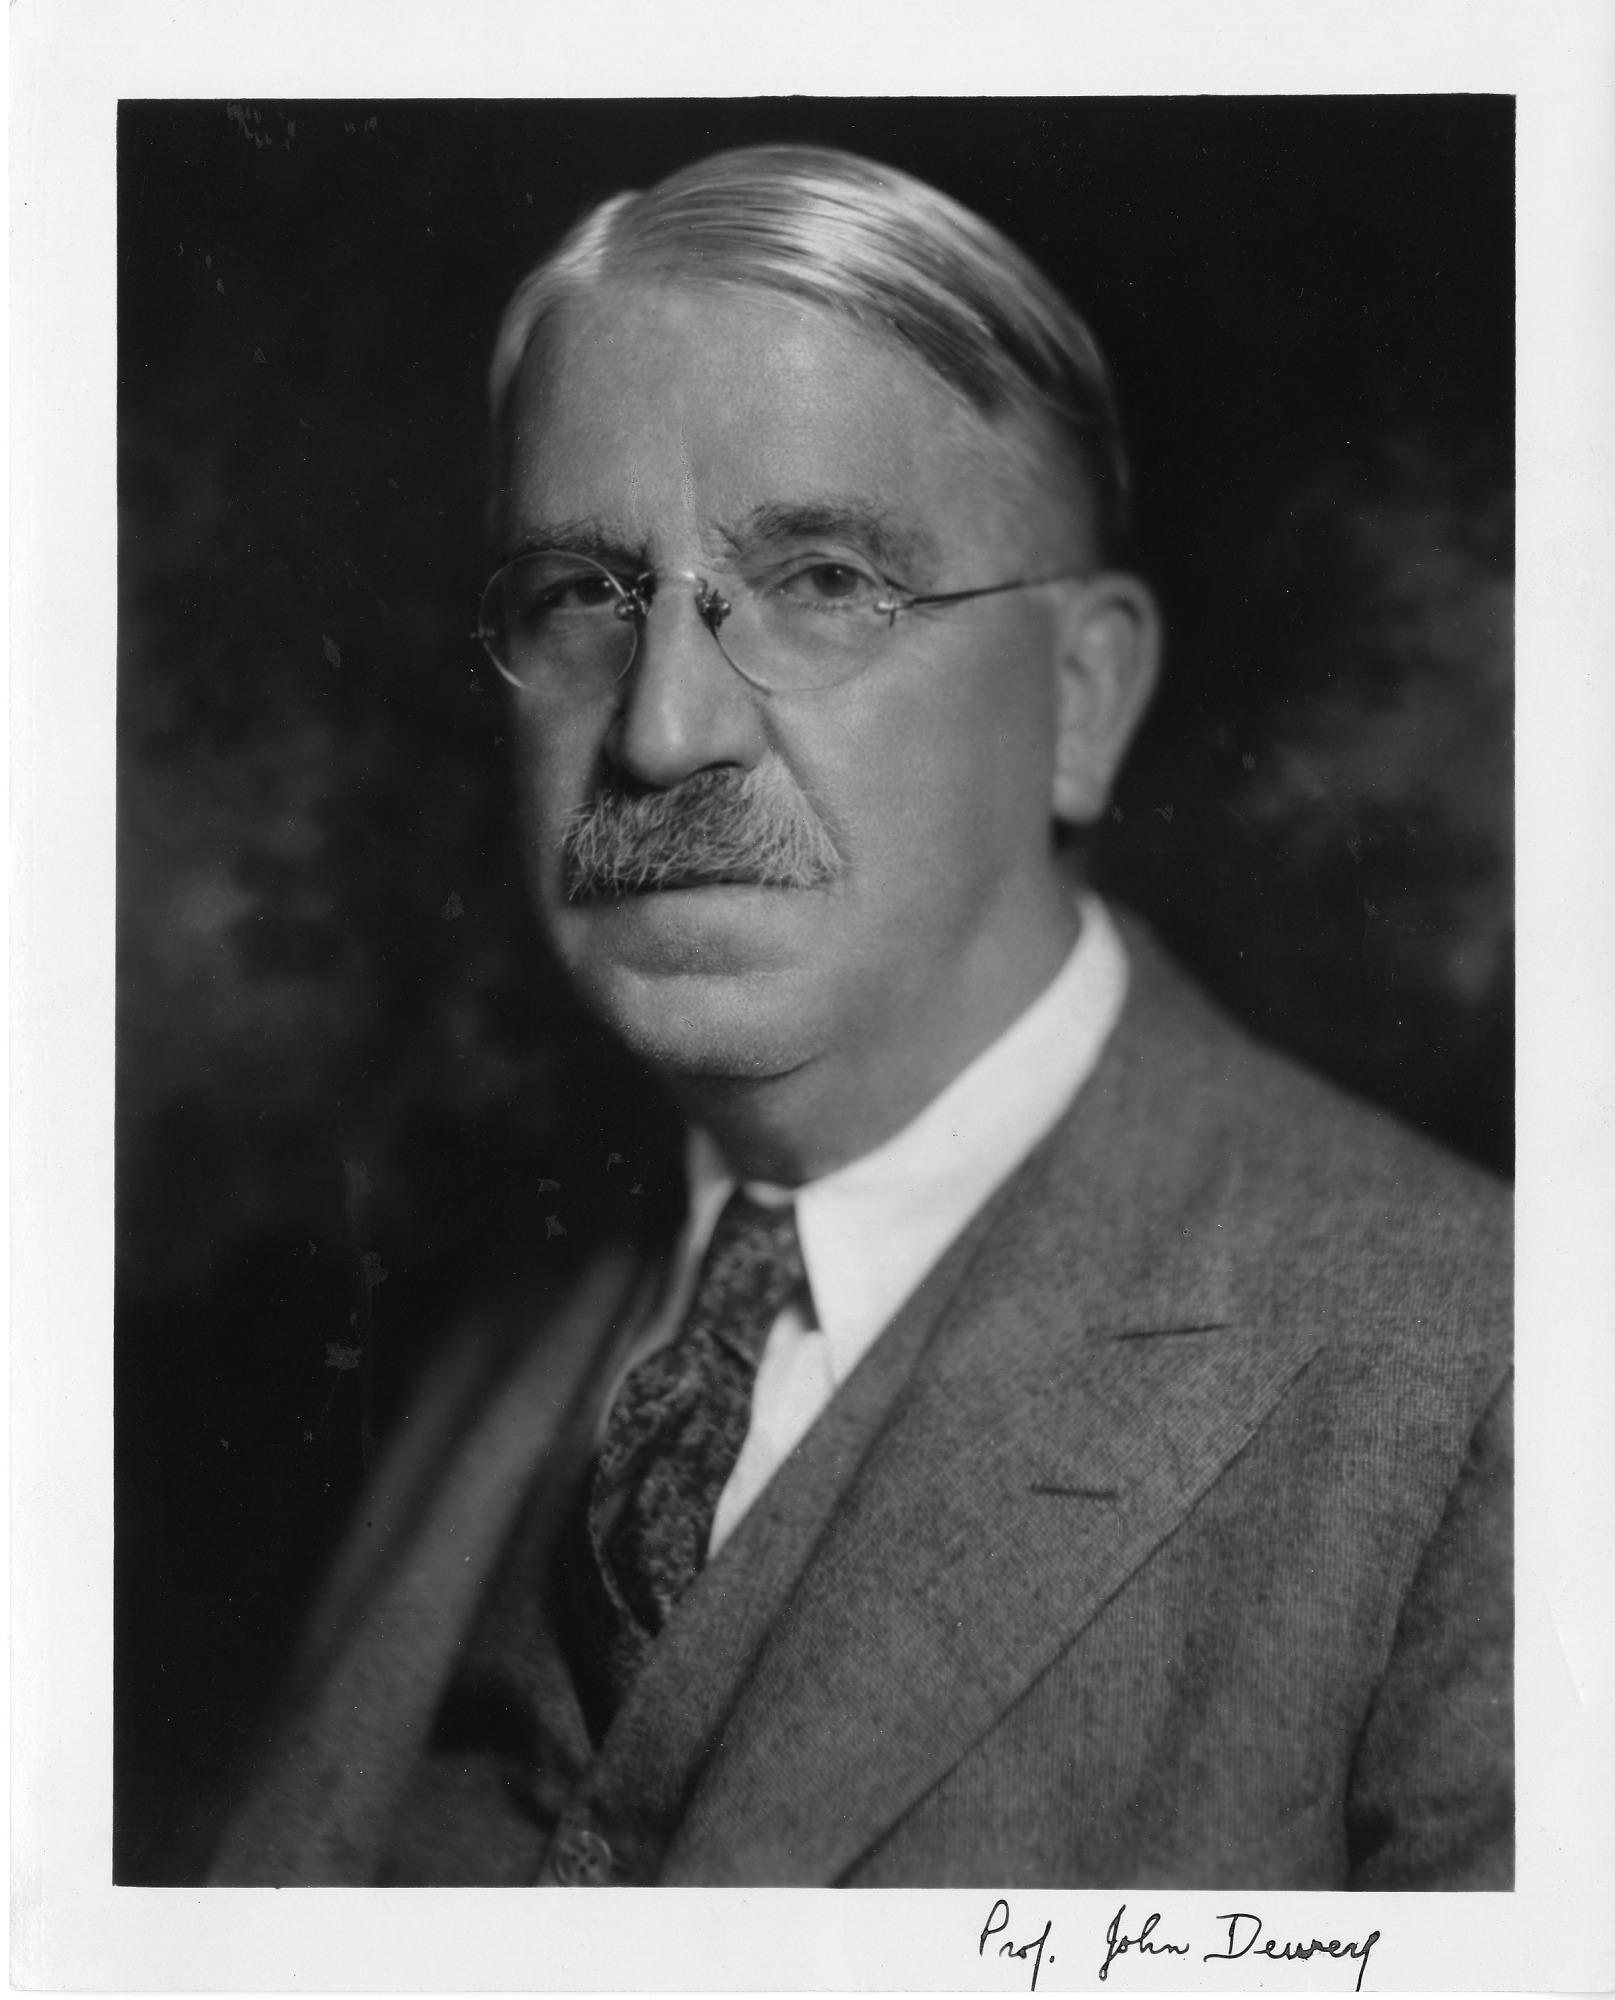 John Dewey (1859-1952), Smithsonian Institution Archives, SIA Acc. 90-105 [SIA2008-0456].